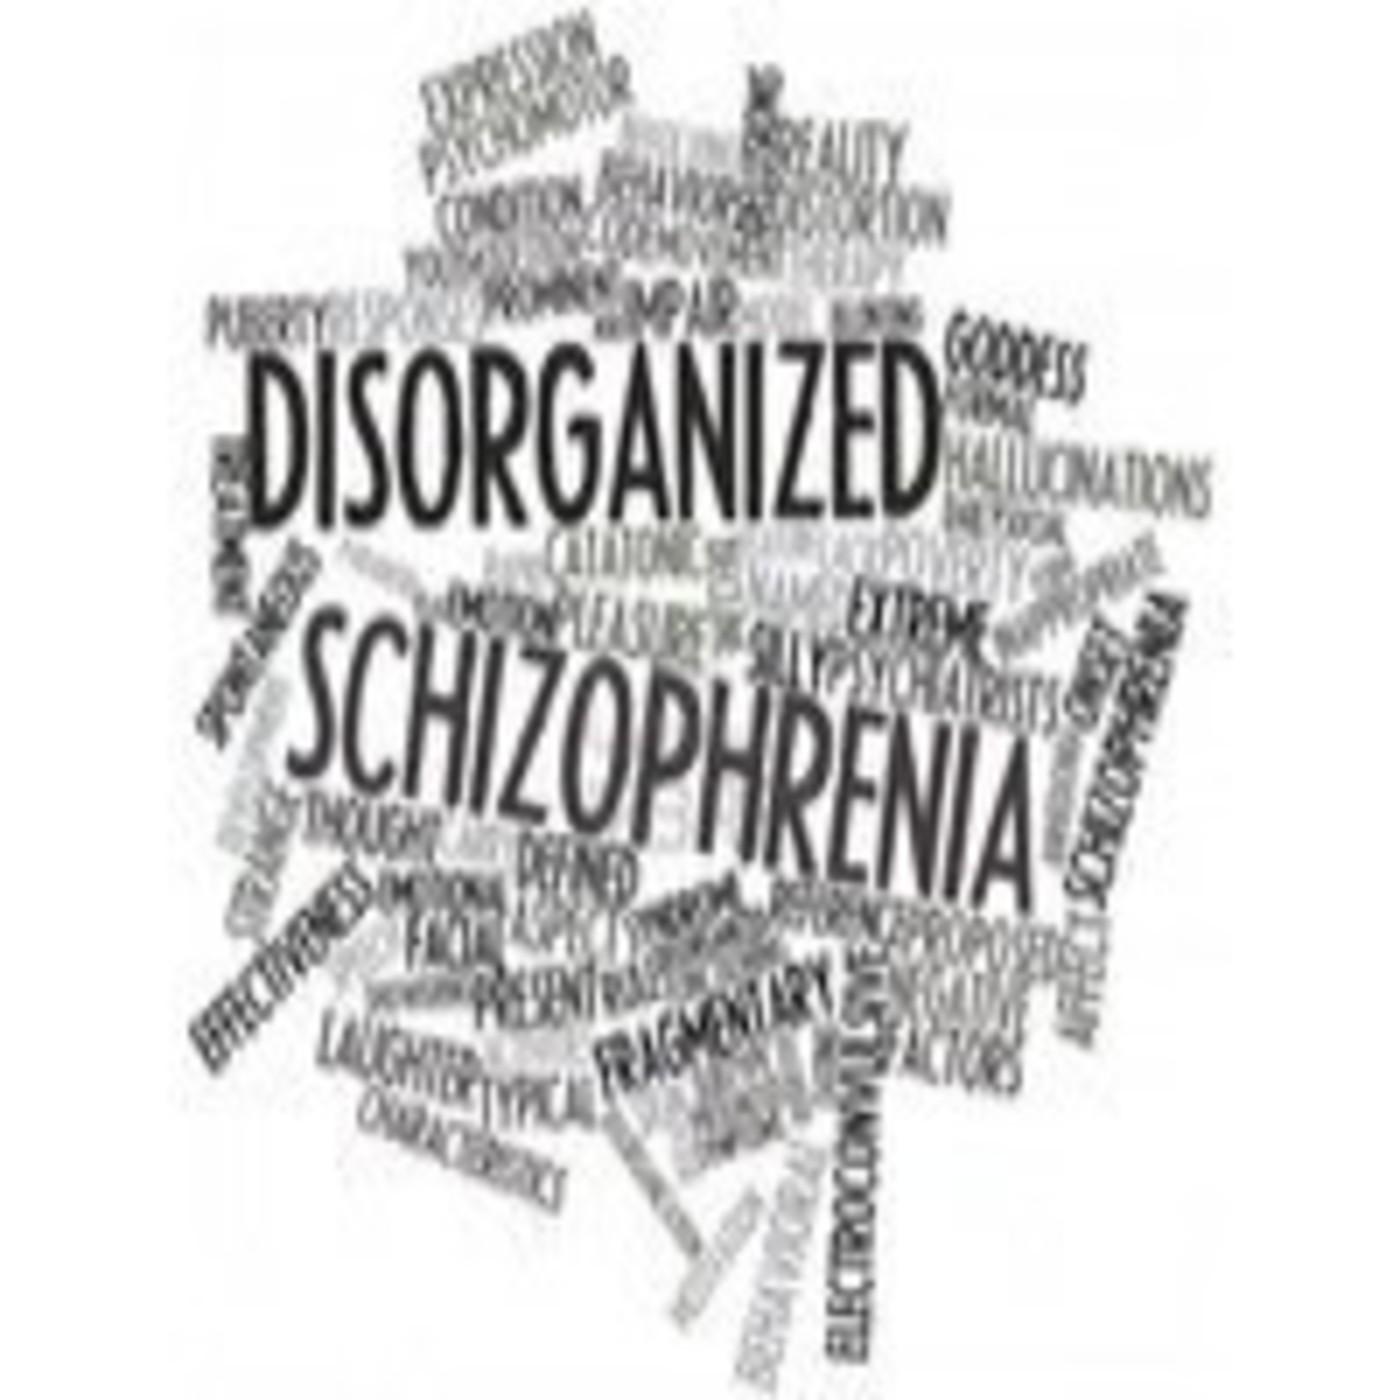 <![CDATA[Podcast Eskizofrenia Interruptor Radio]]>